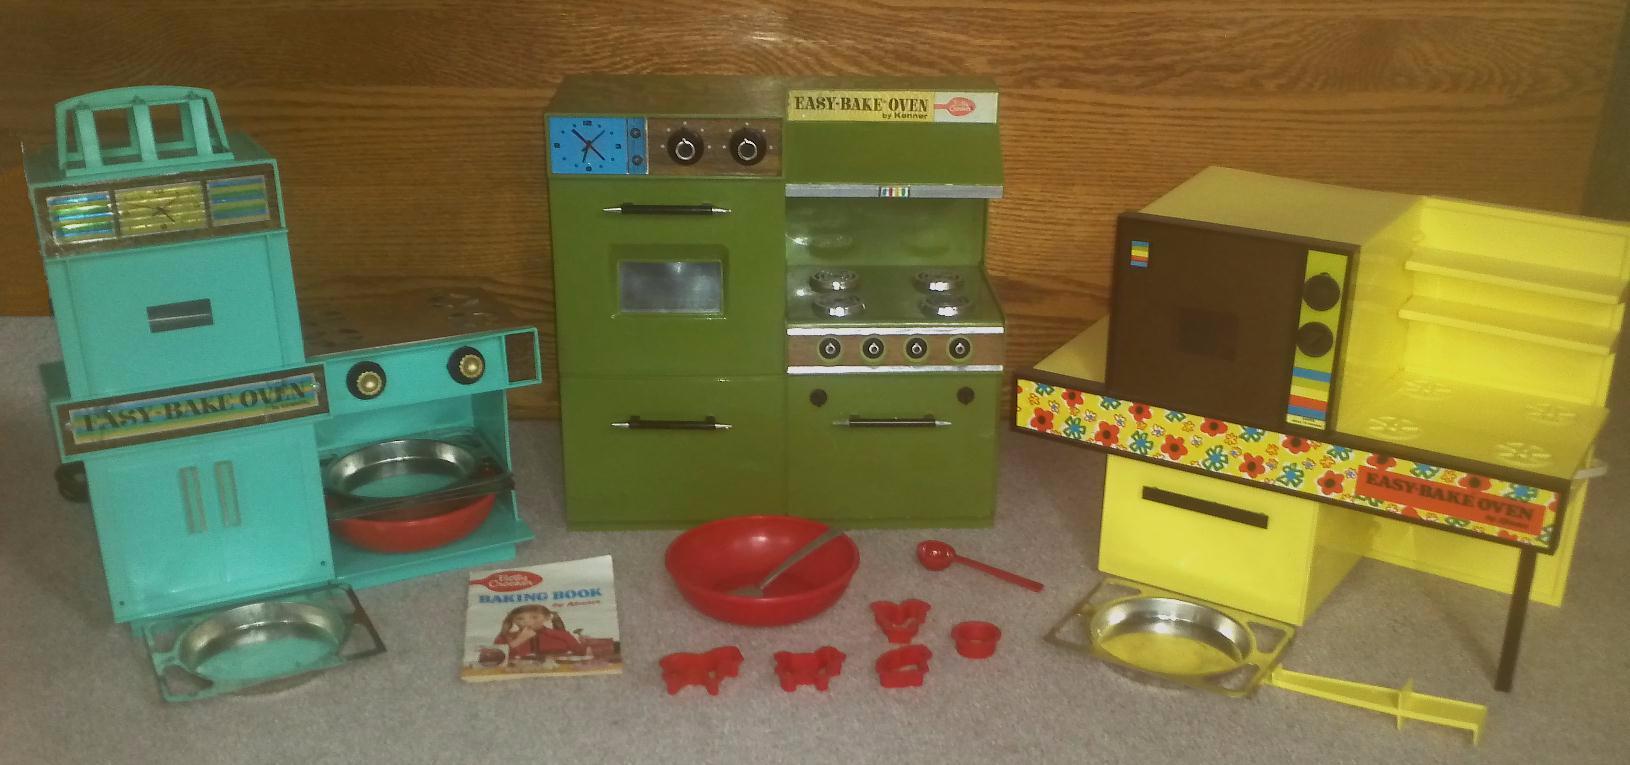 Easy Bake Oven Wikiwand